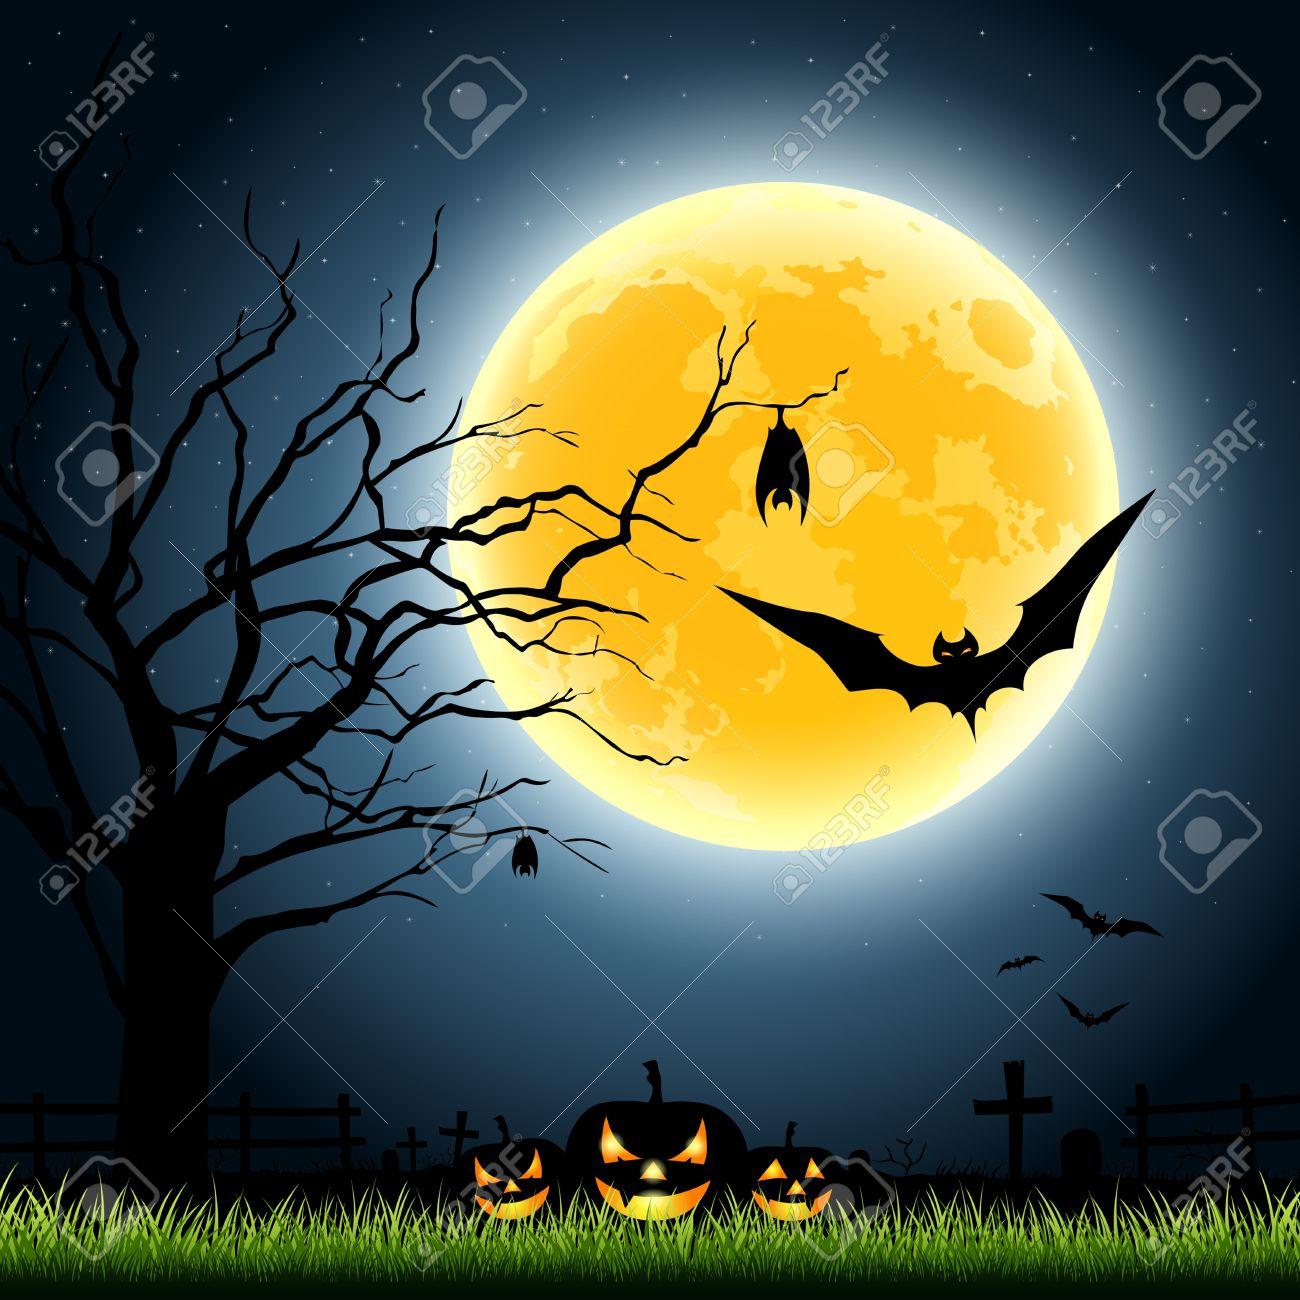 Halloween Full Moon, Illustration Royalty Free Cliparts, Vectors ...